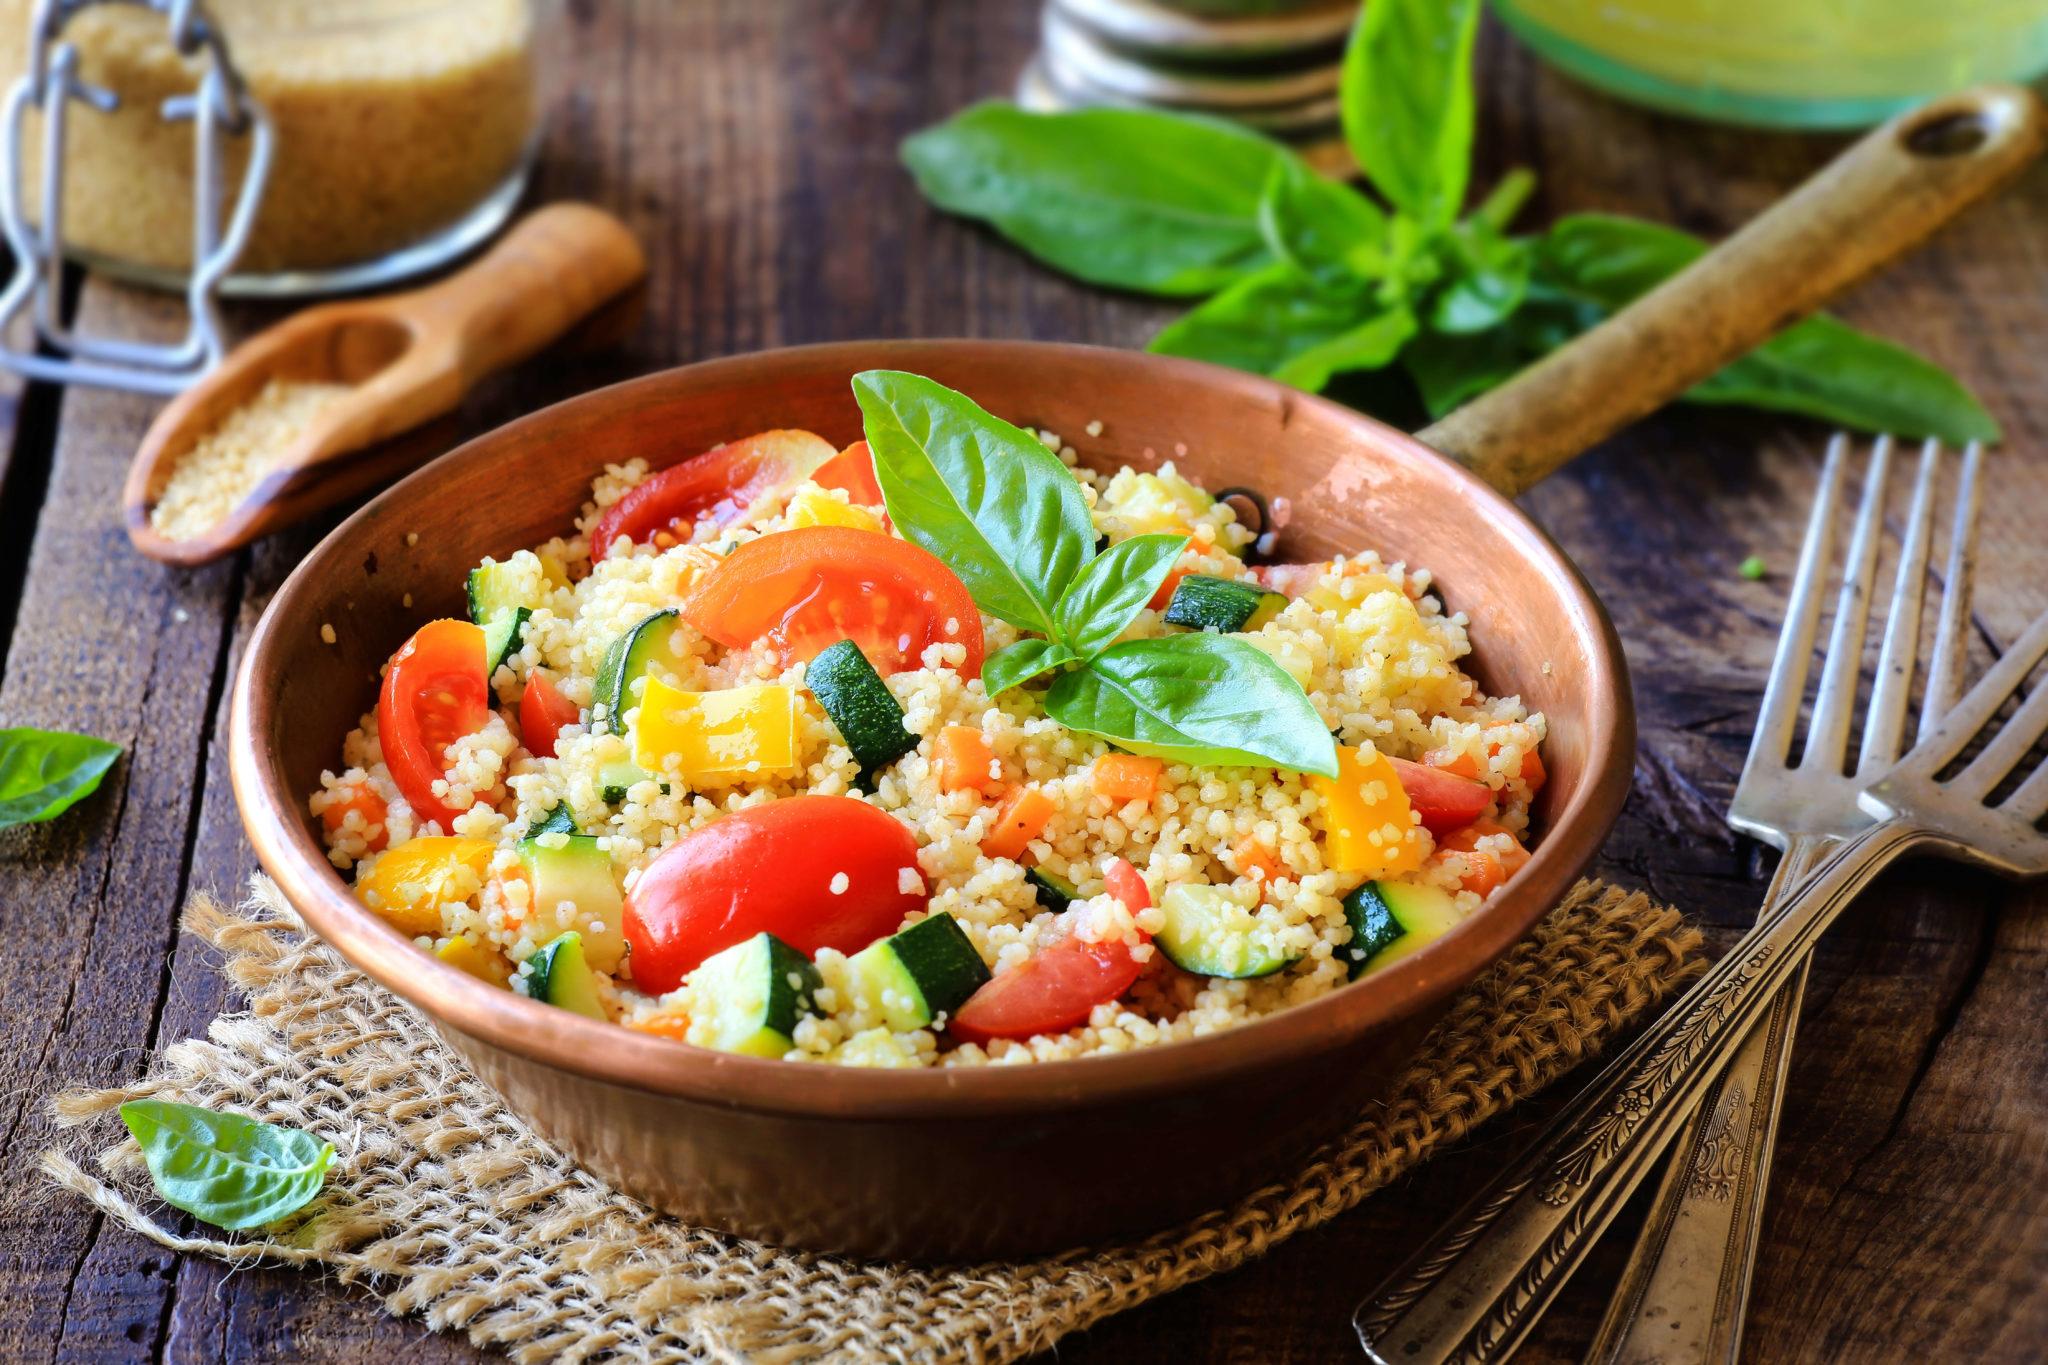 Upfit bunter Couscous-Salat